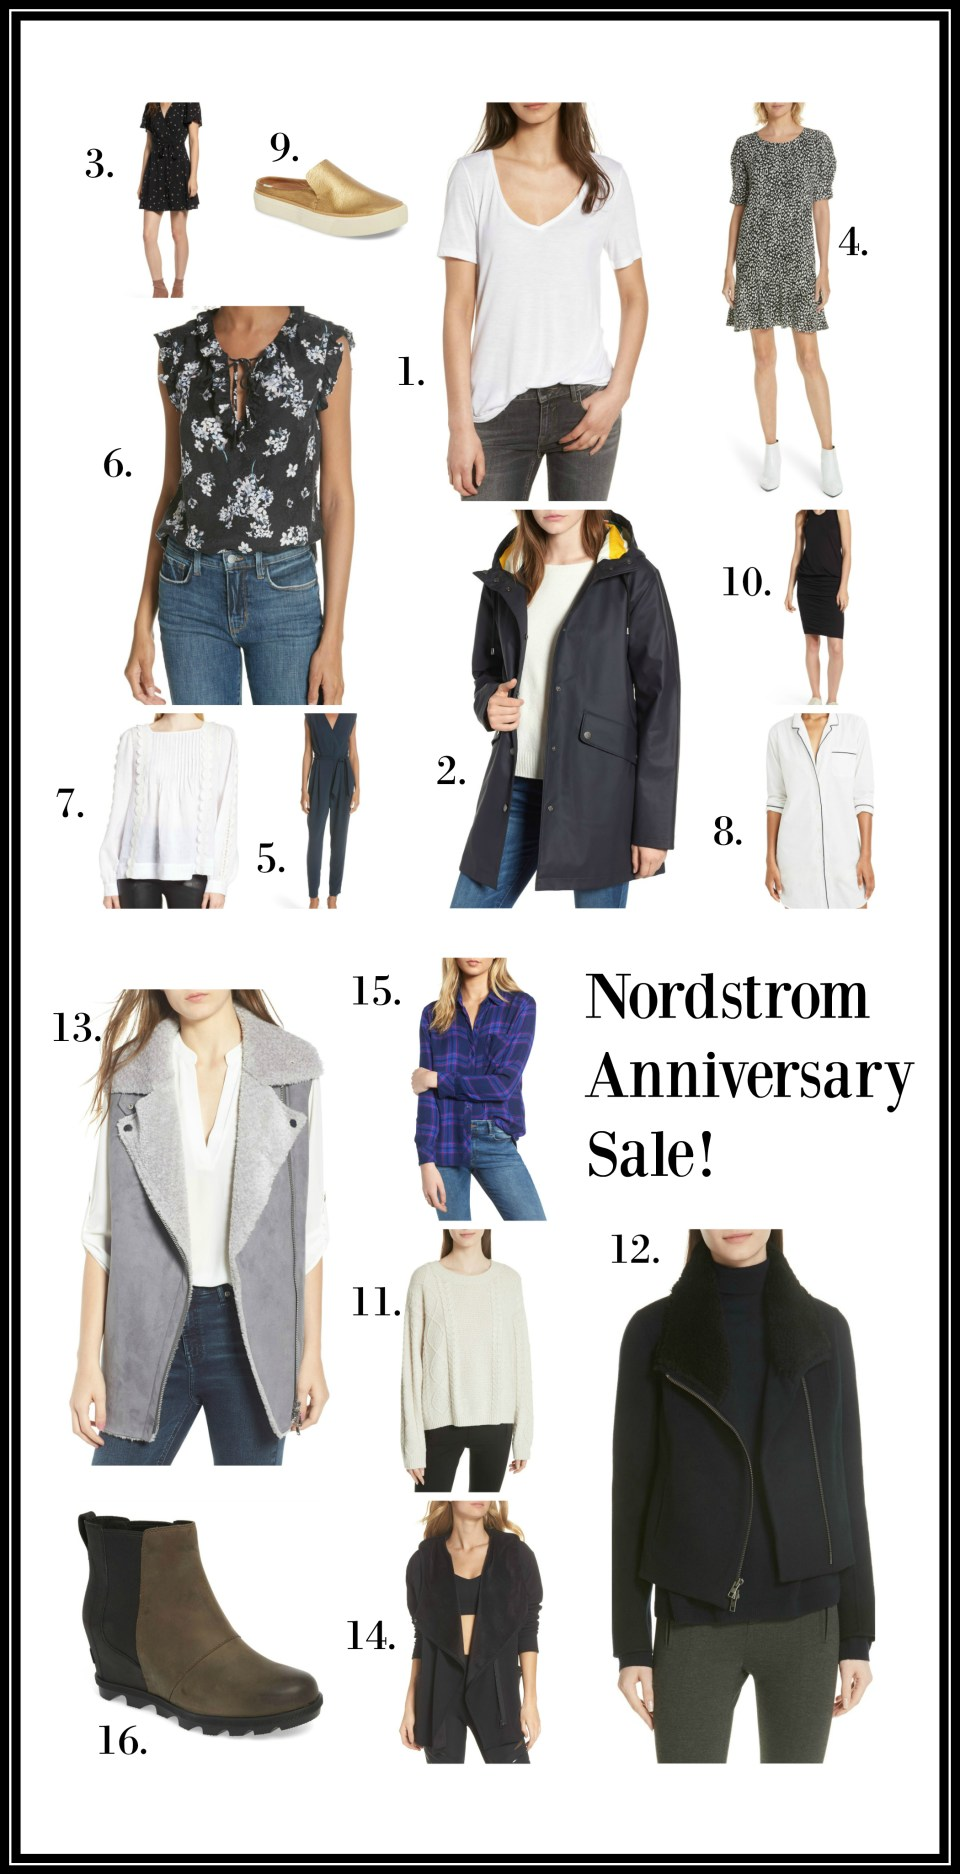 Nordstrom Anniversary Sale large.jpg